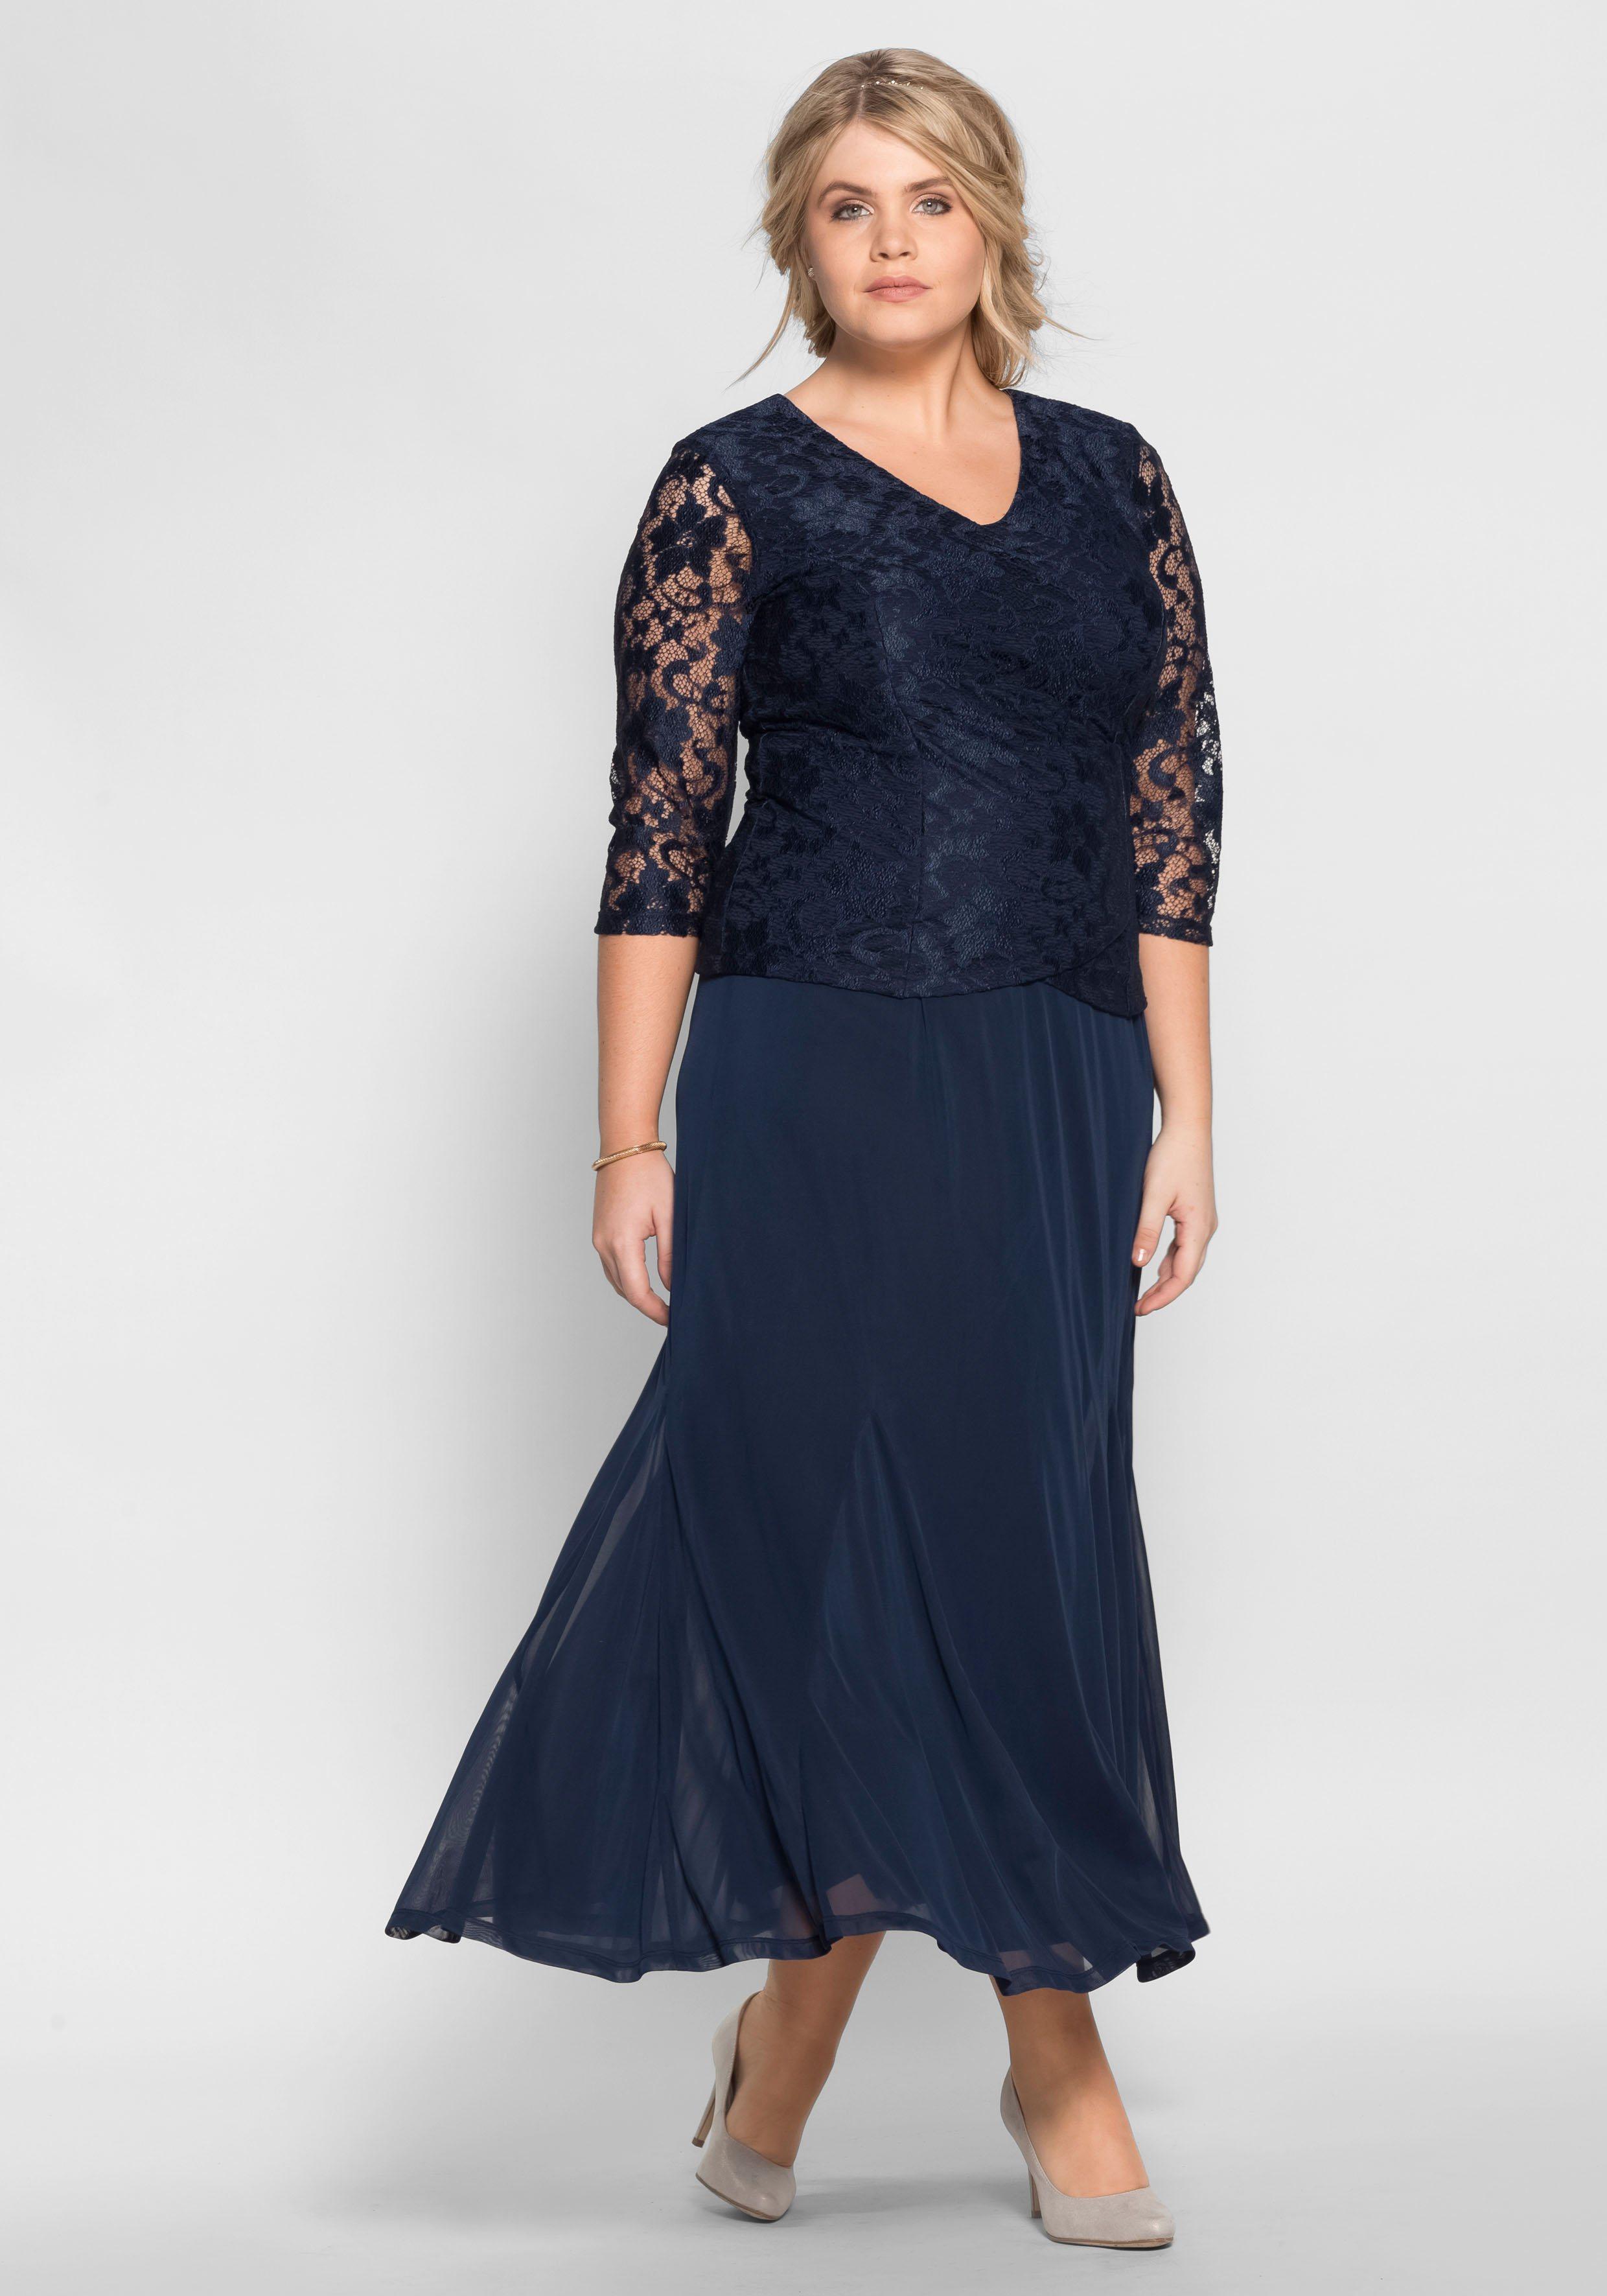 Kleid große Größen